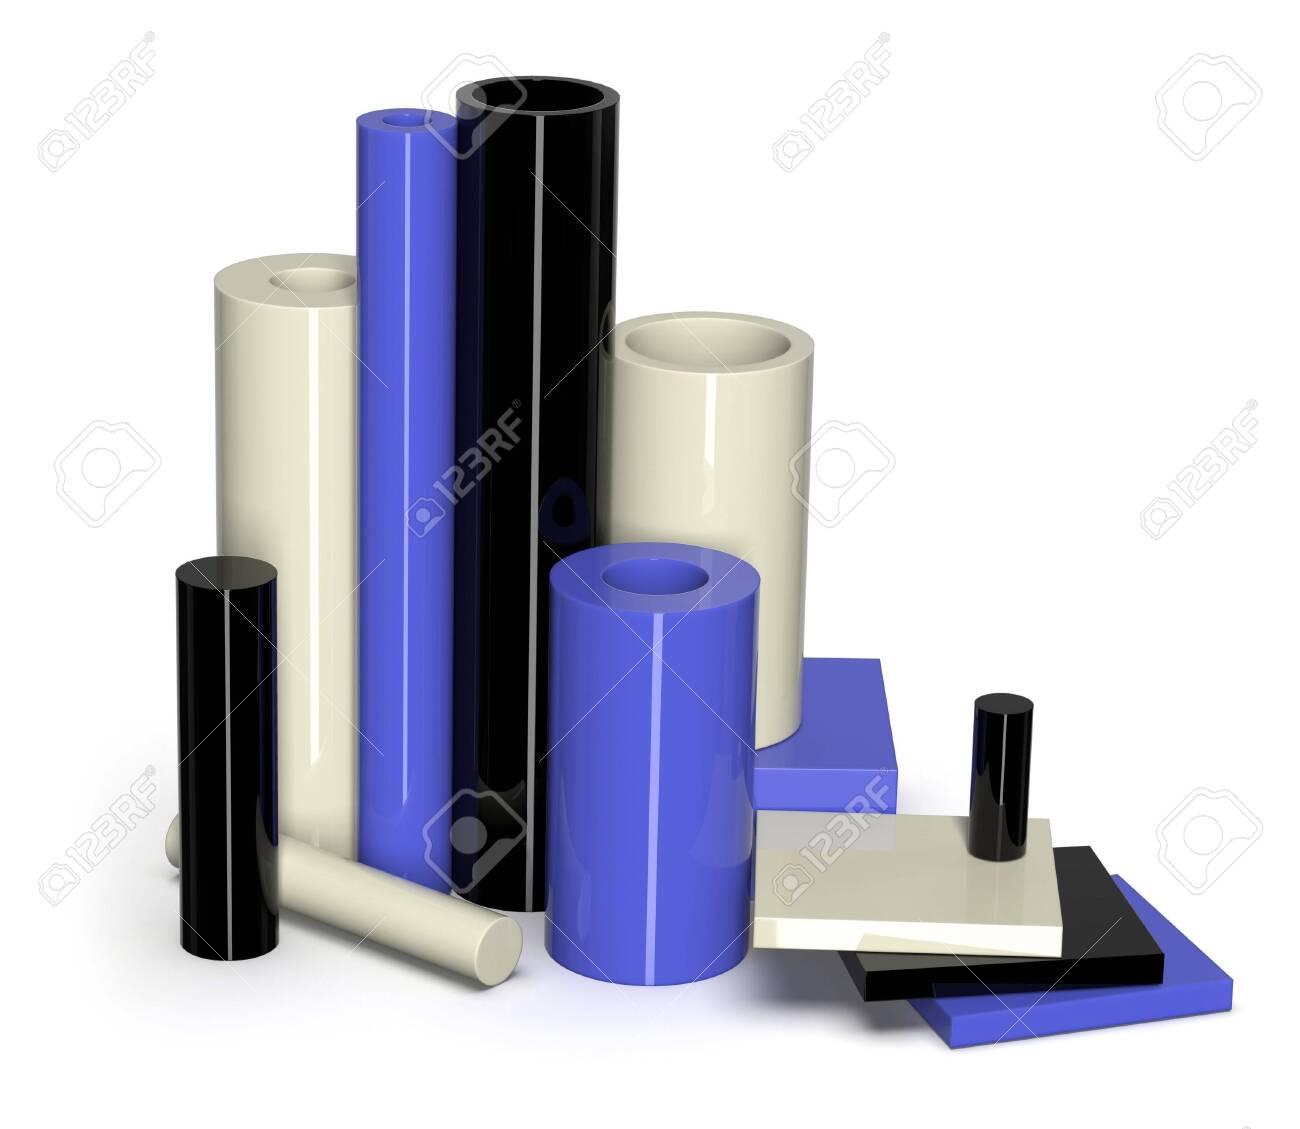 Cast nylon samples isolated on white - 122675260